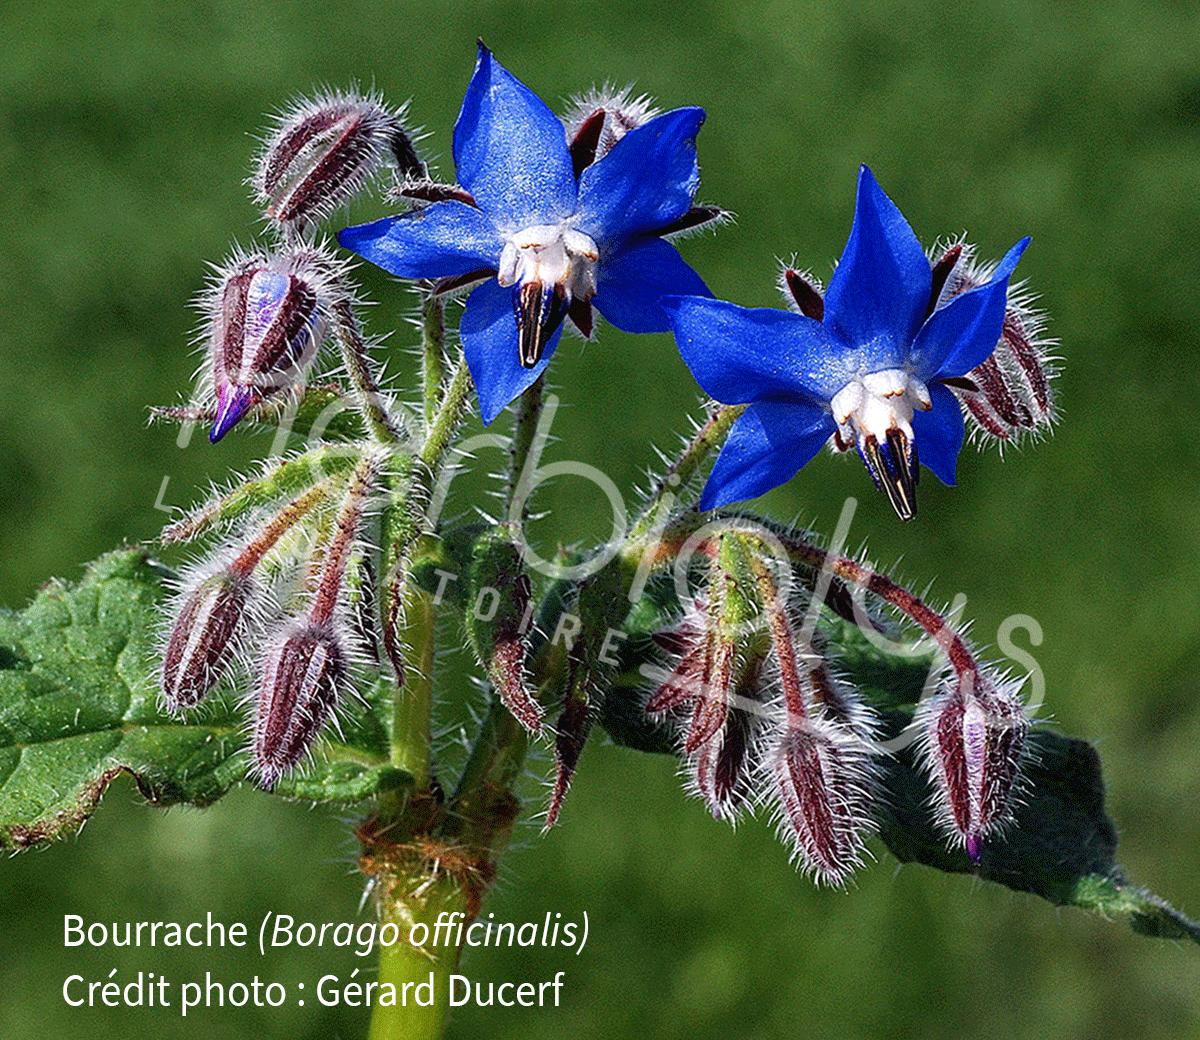 Herbiolys-phytotherapie-bourrache-borago-officinalis